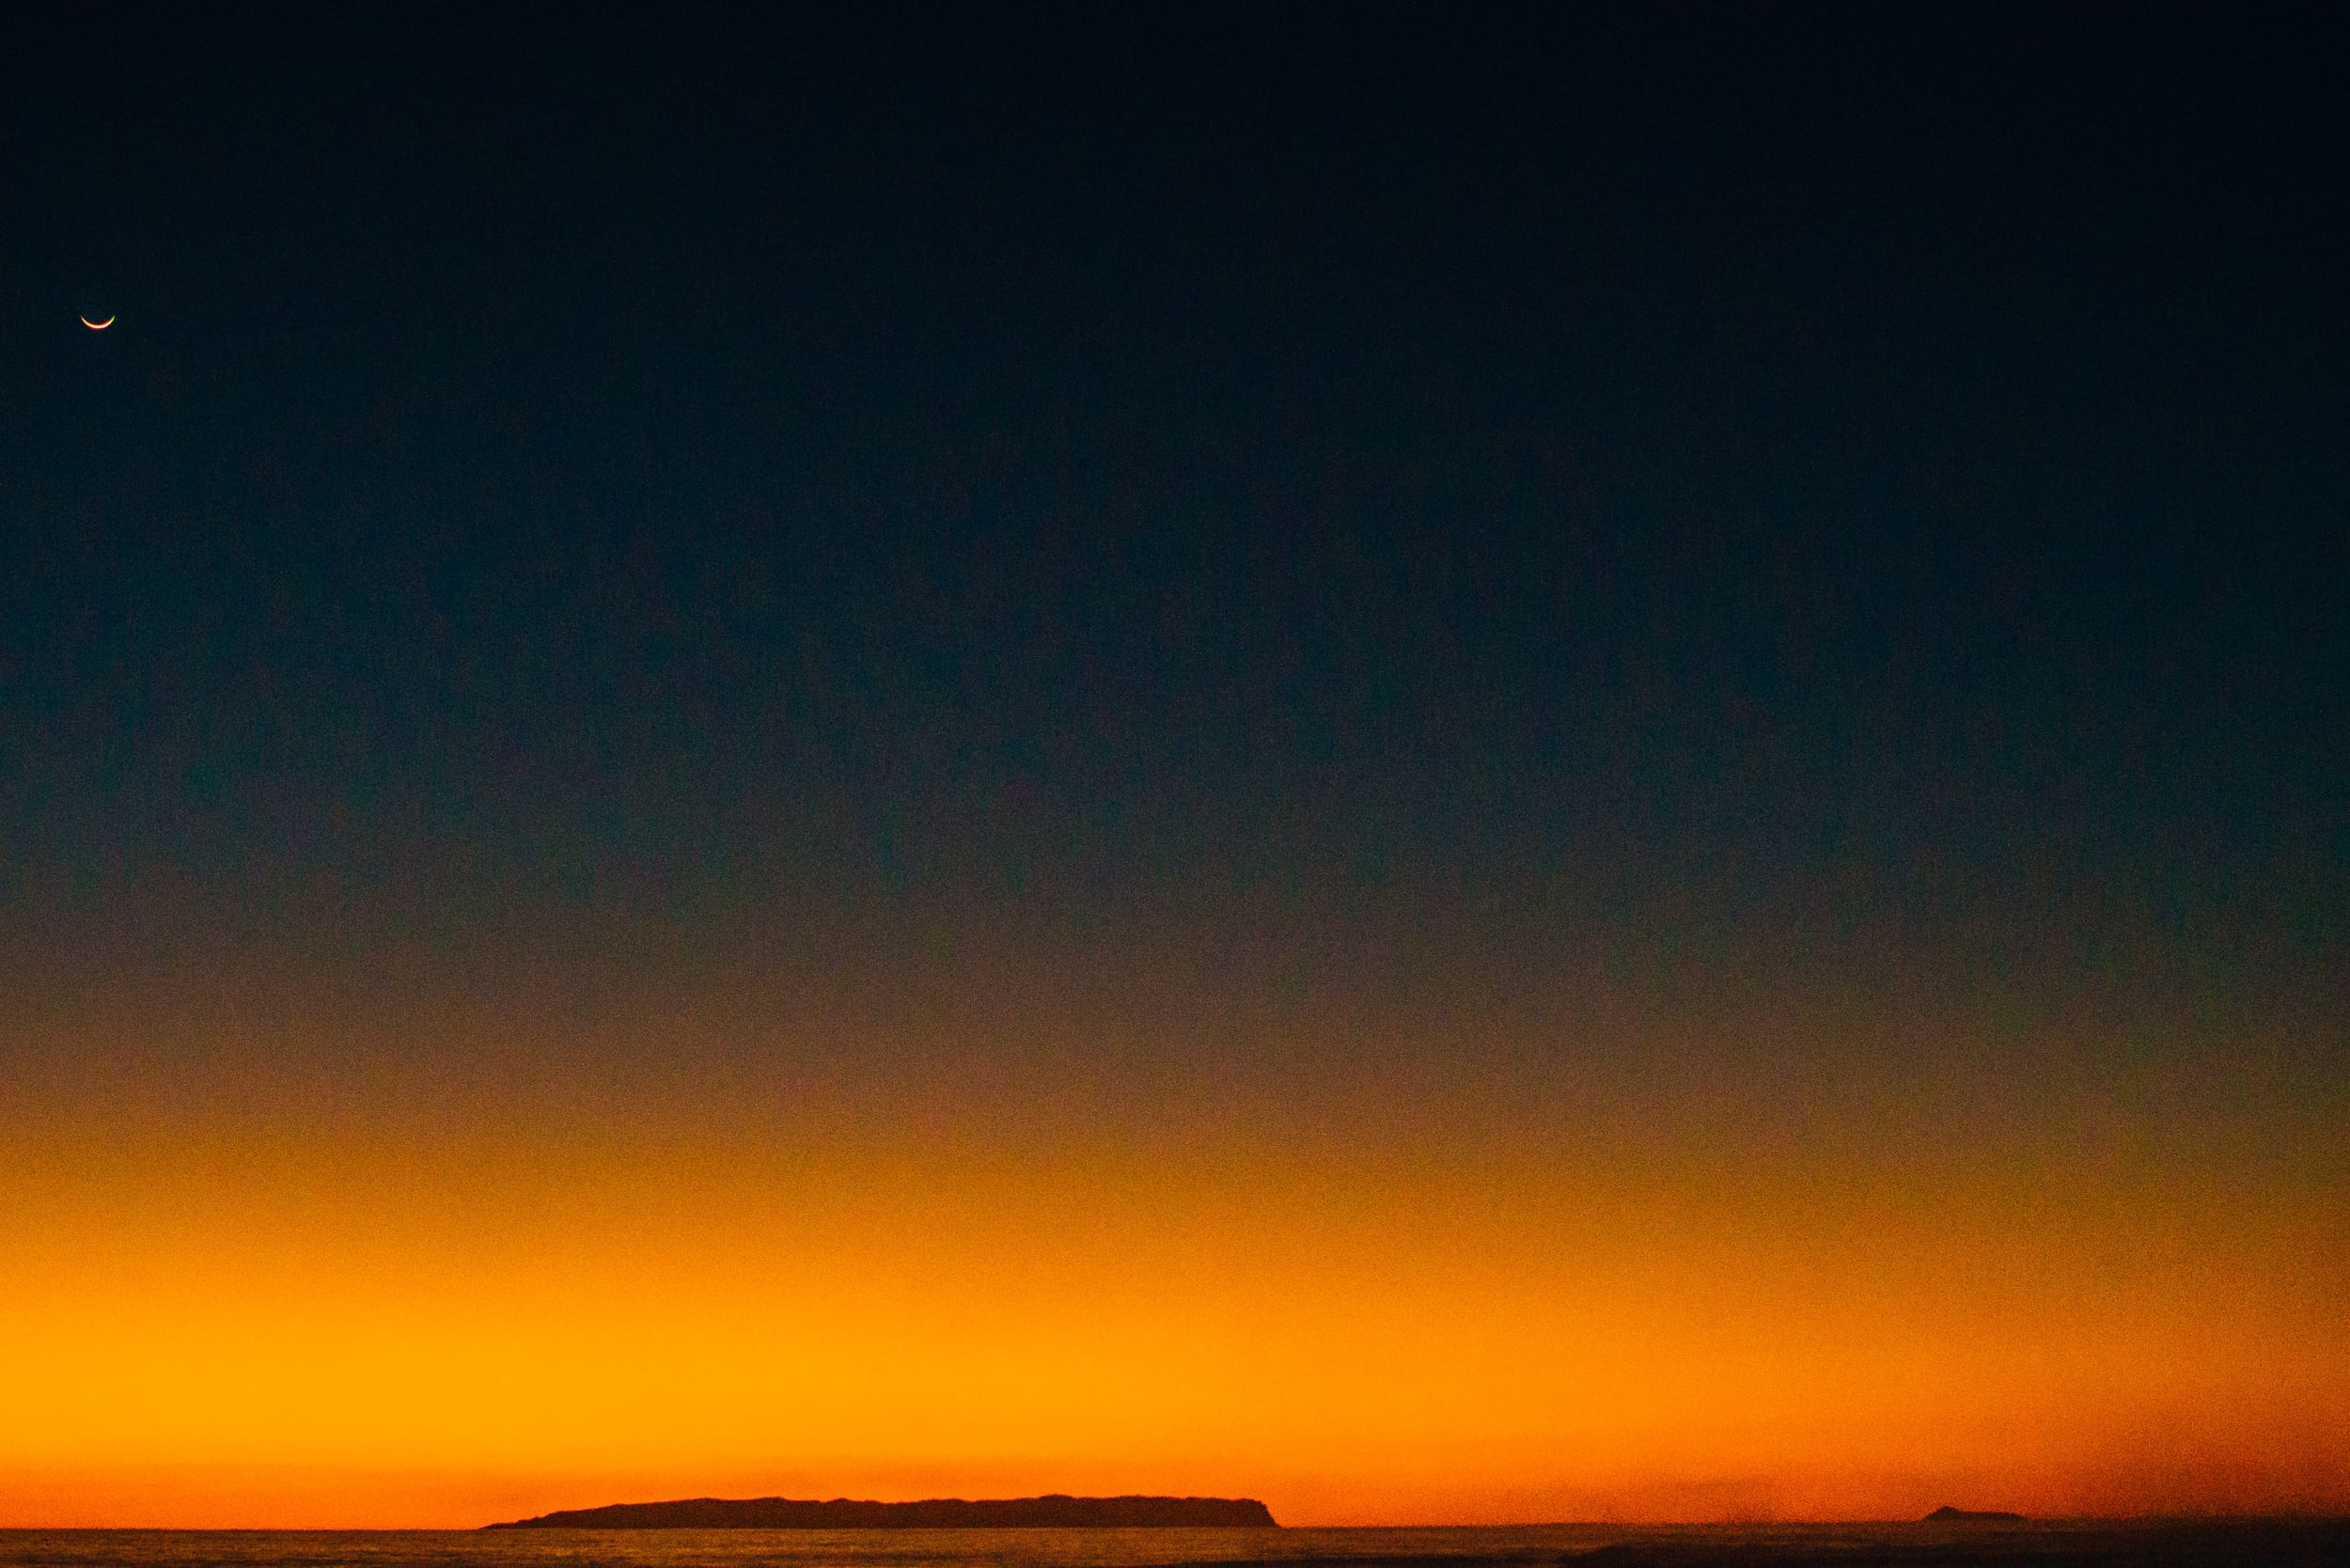 bryce-johnson-photography-kauai-hawaii-surfing-a7rii-aquatech-water-ocean-13.jpg